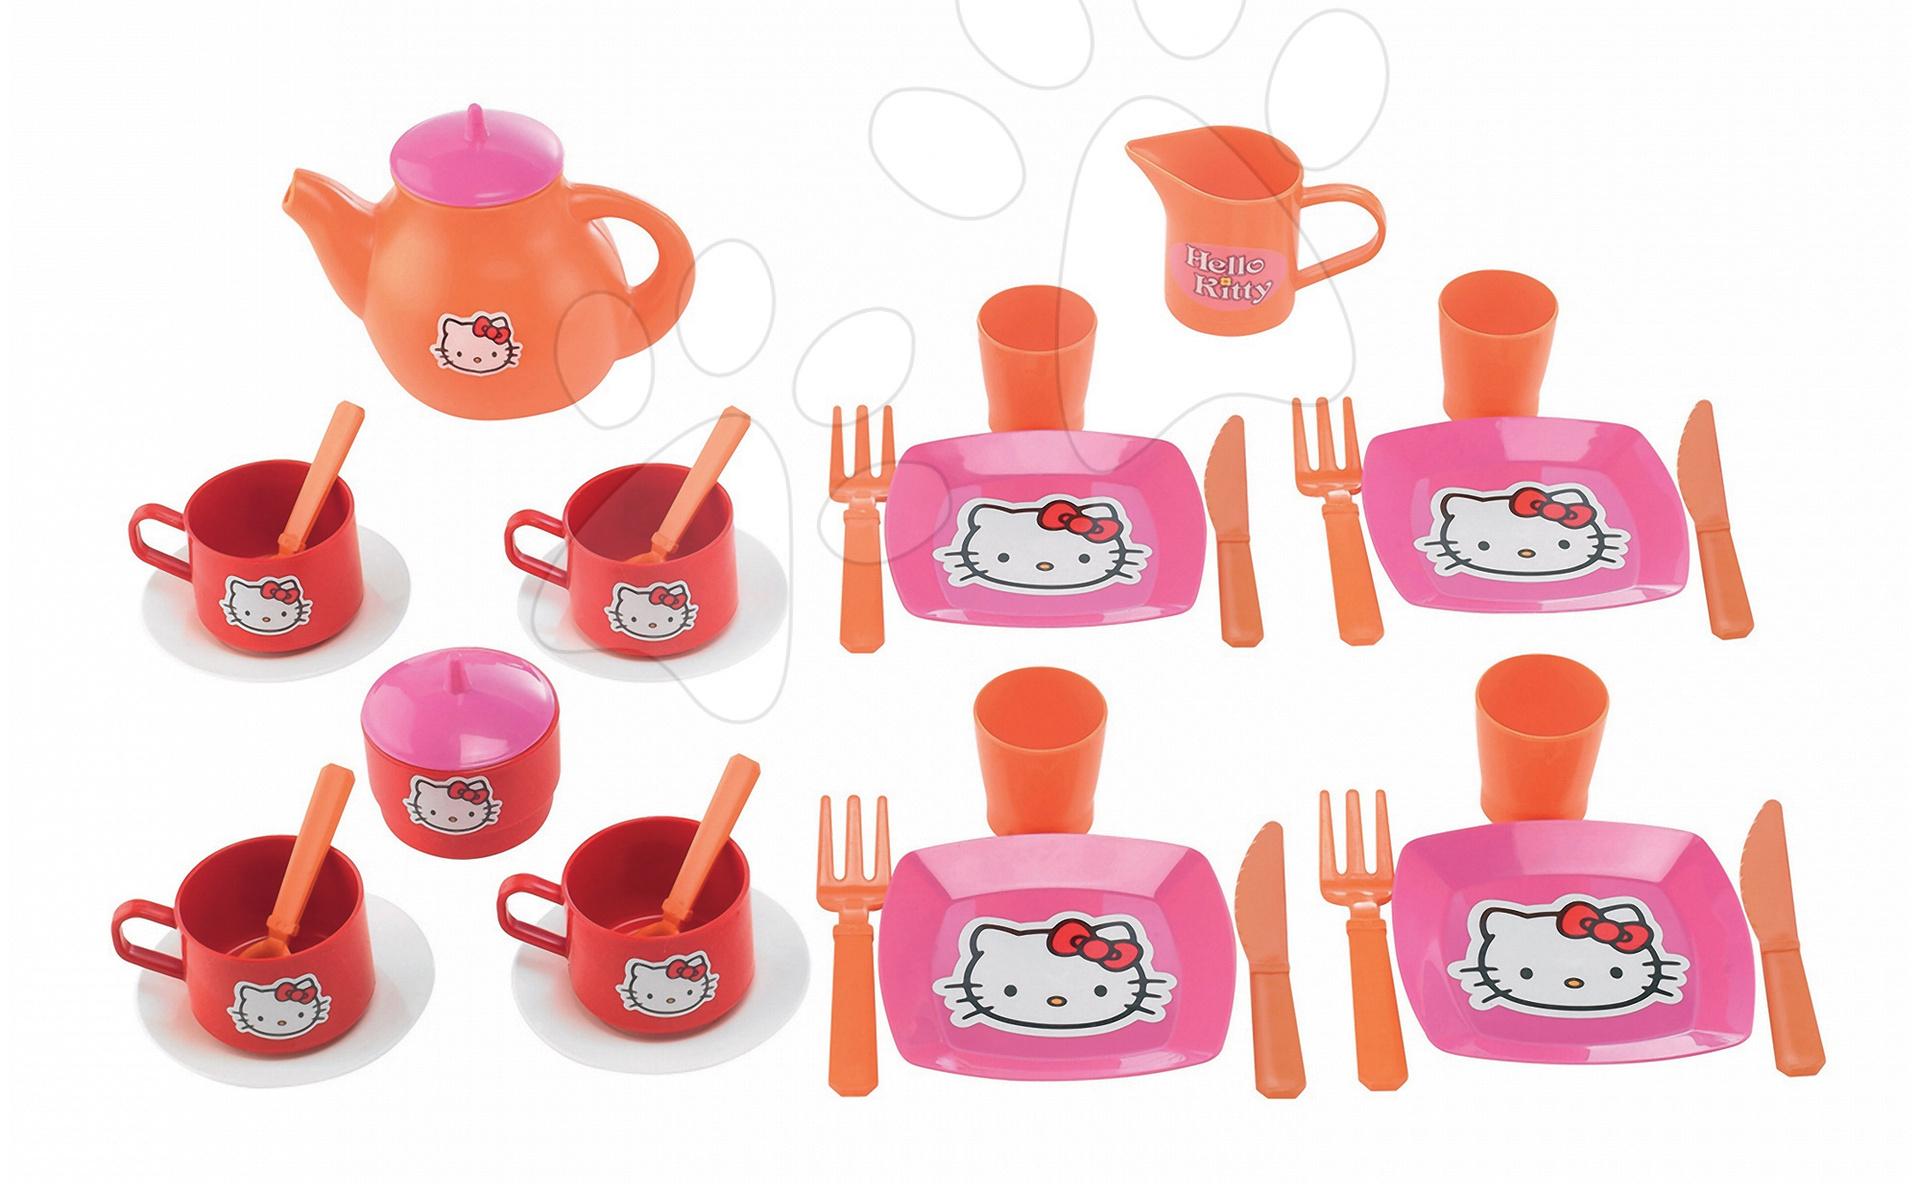 Čajni servis Hello Kitty Écoiffier velik z 33 dodatki rožnato-oranžna od 18 mes